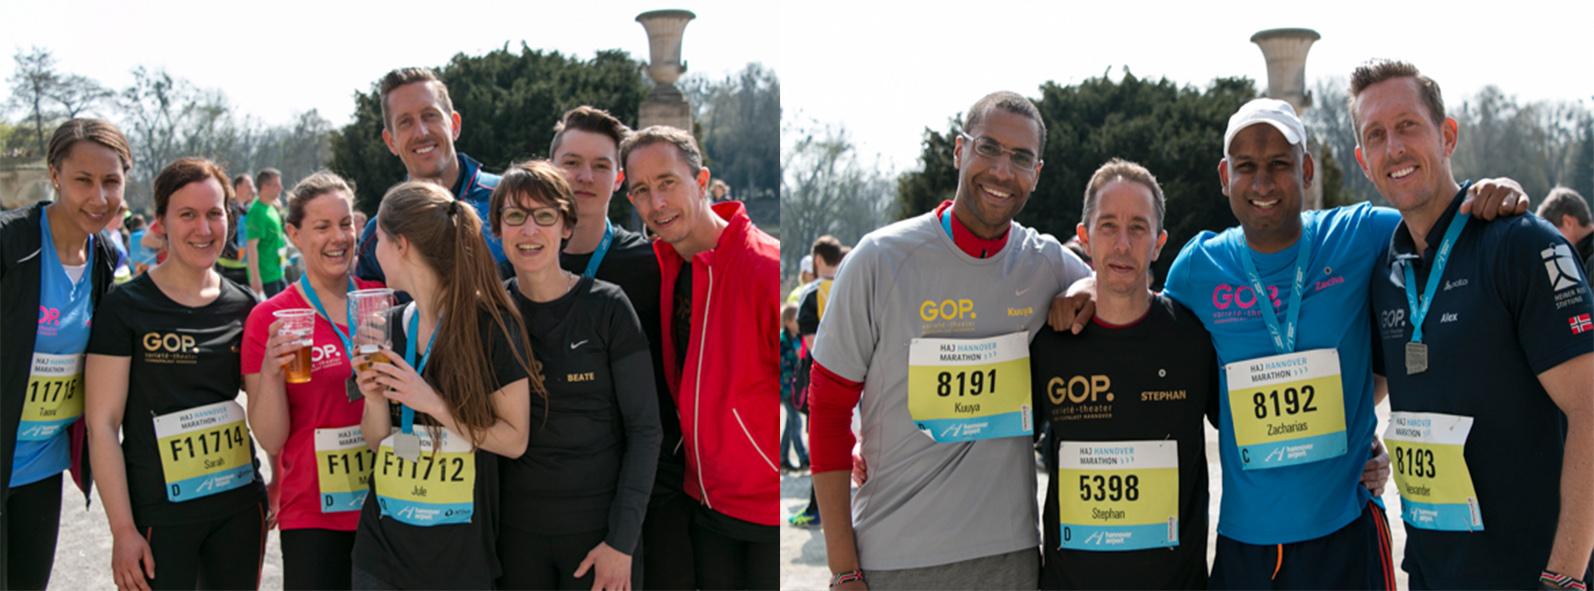 Hannover Marathon3